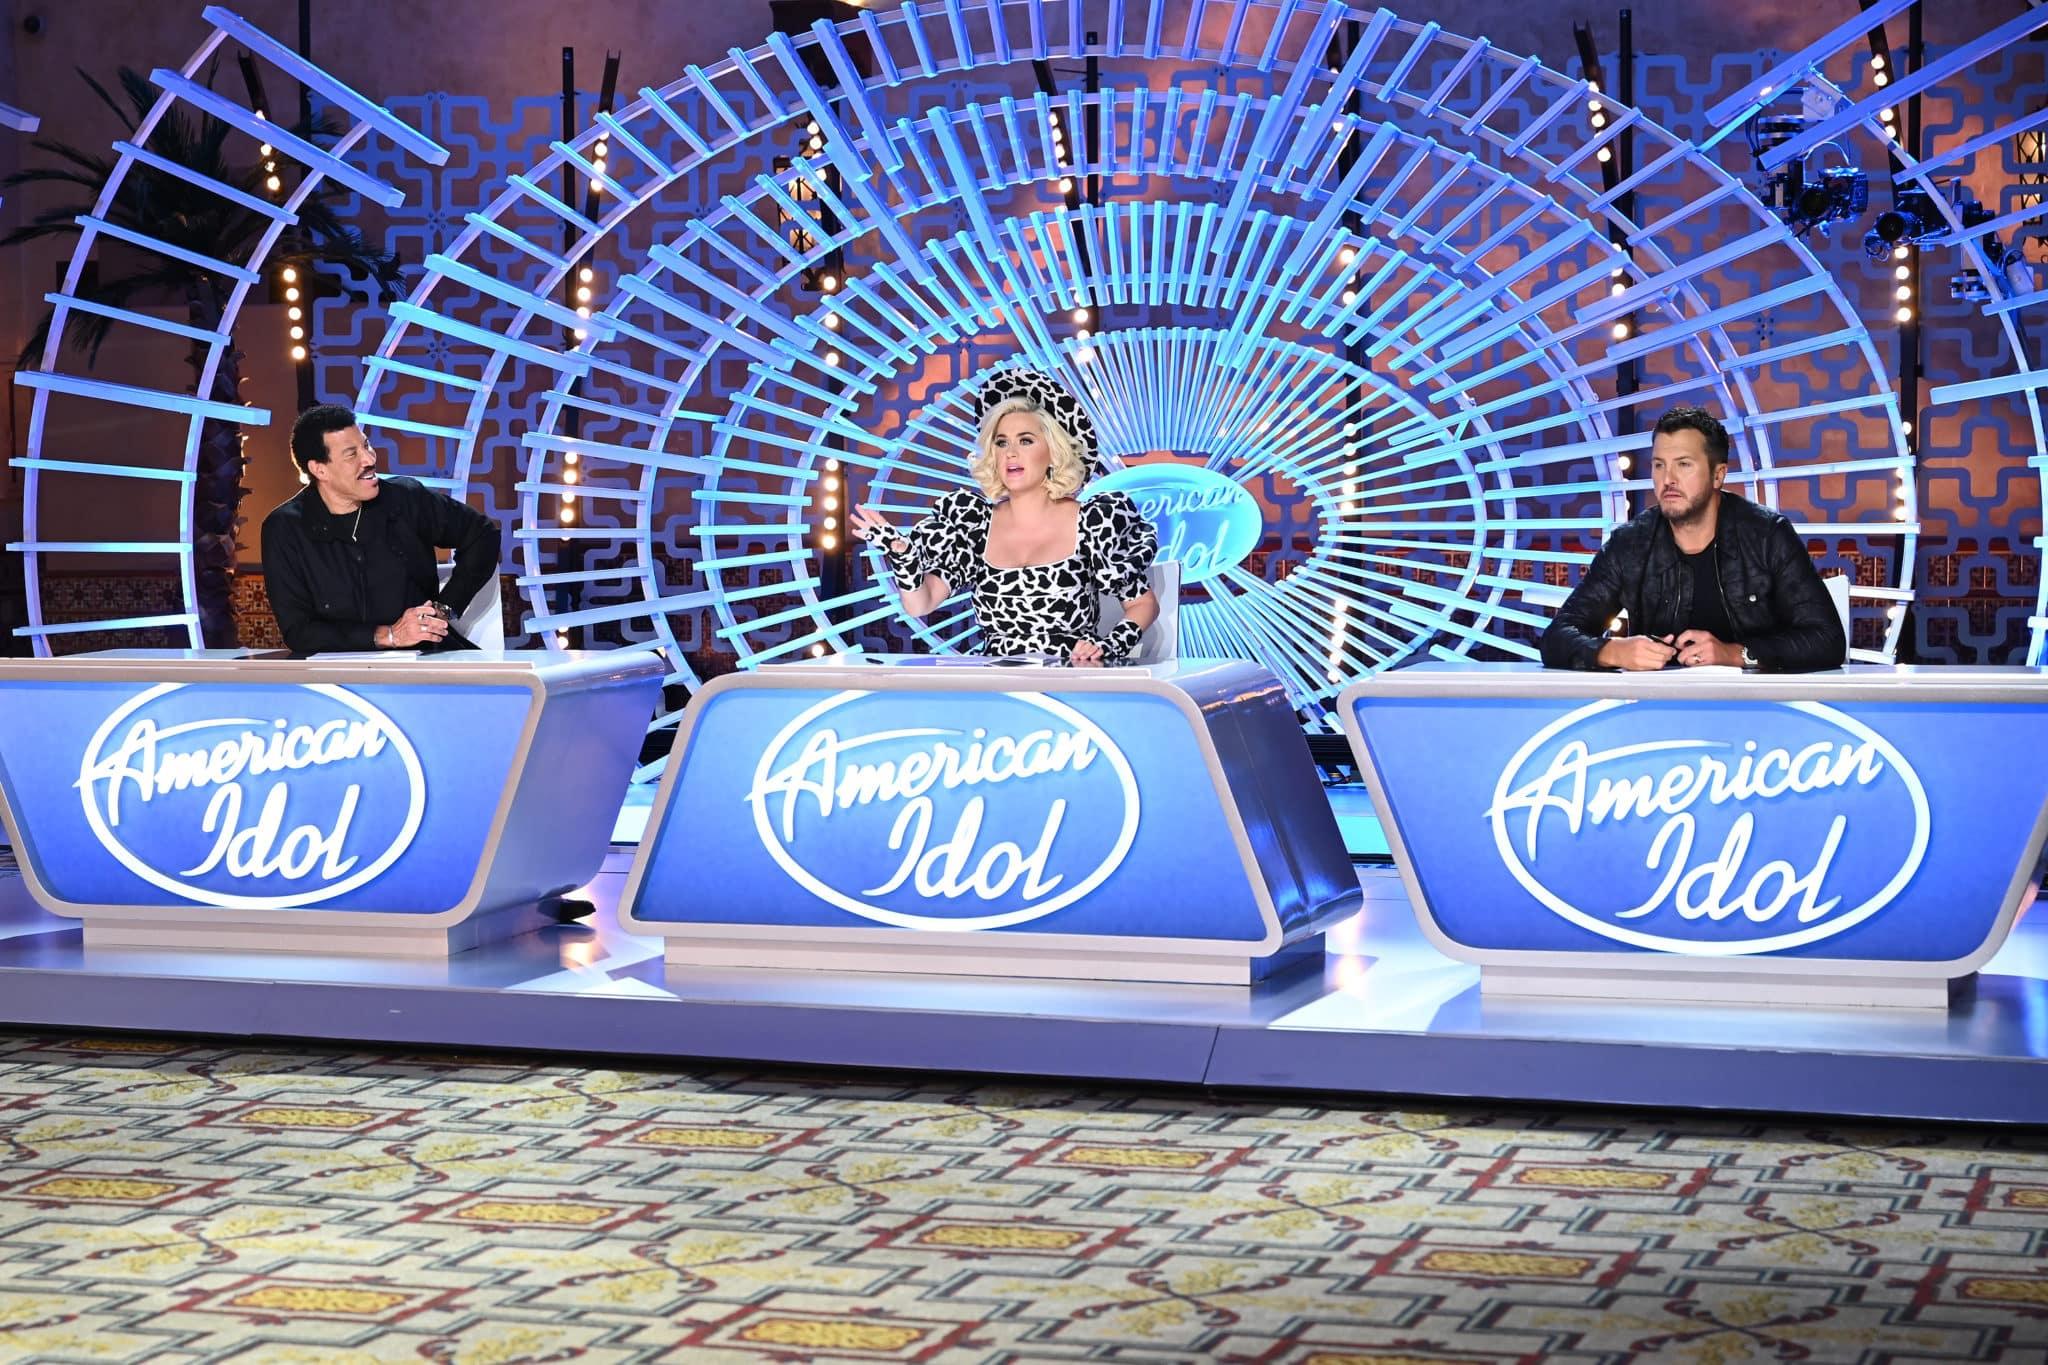 American Idol 2021 Cast Photos and BTS Gallery • mjsbigblog